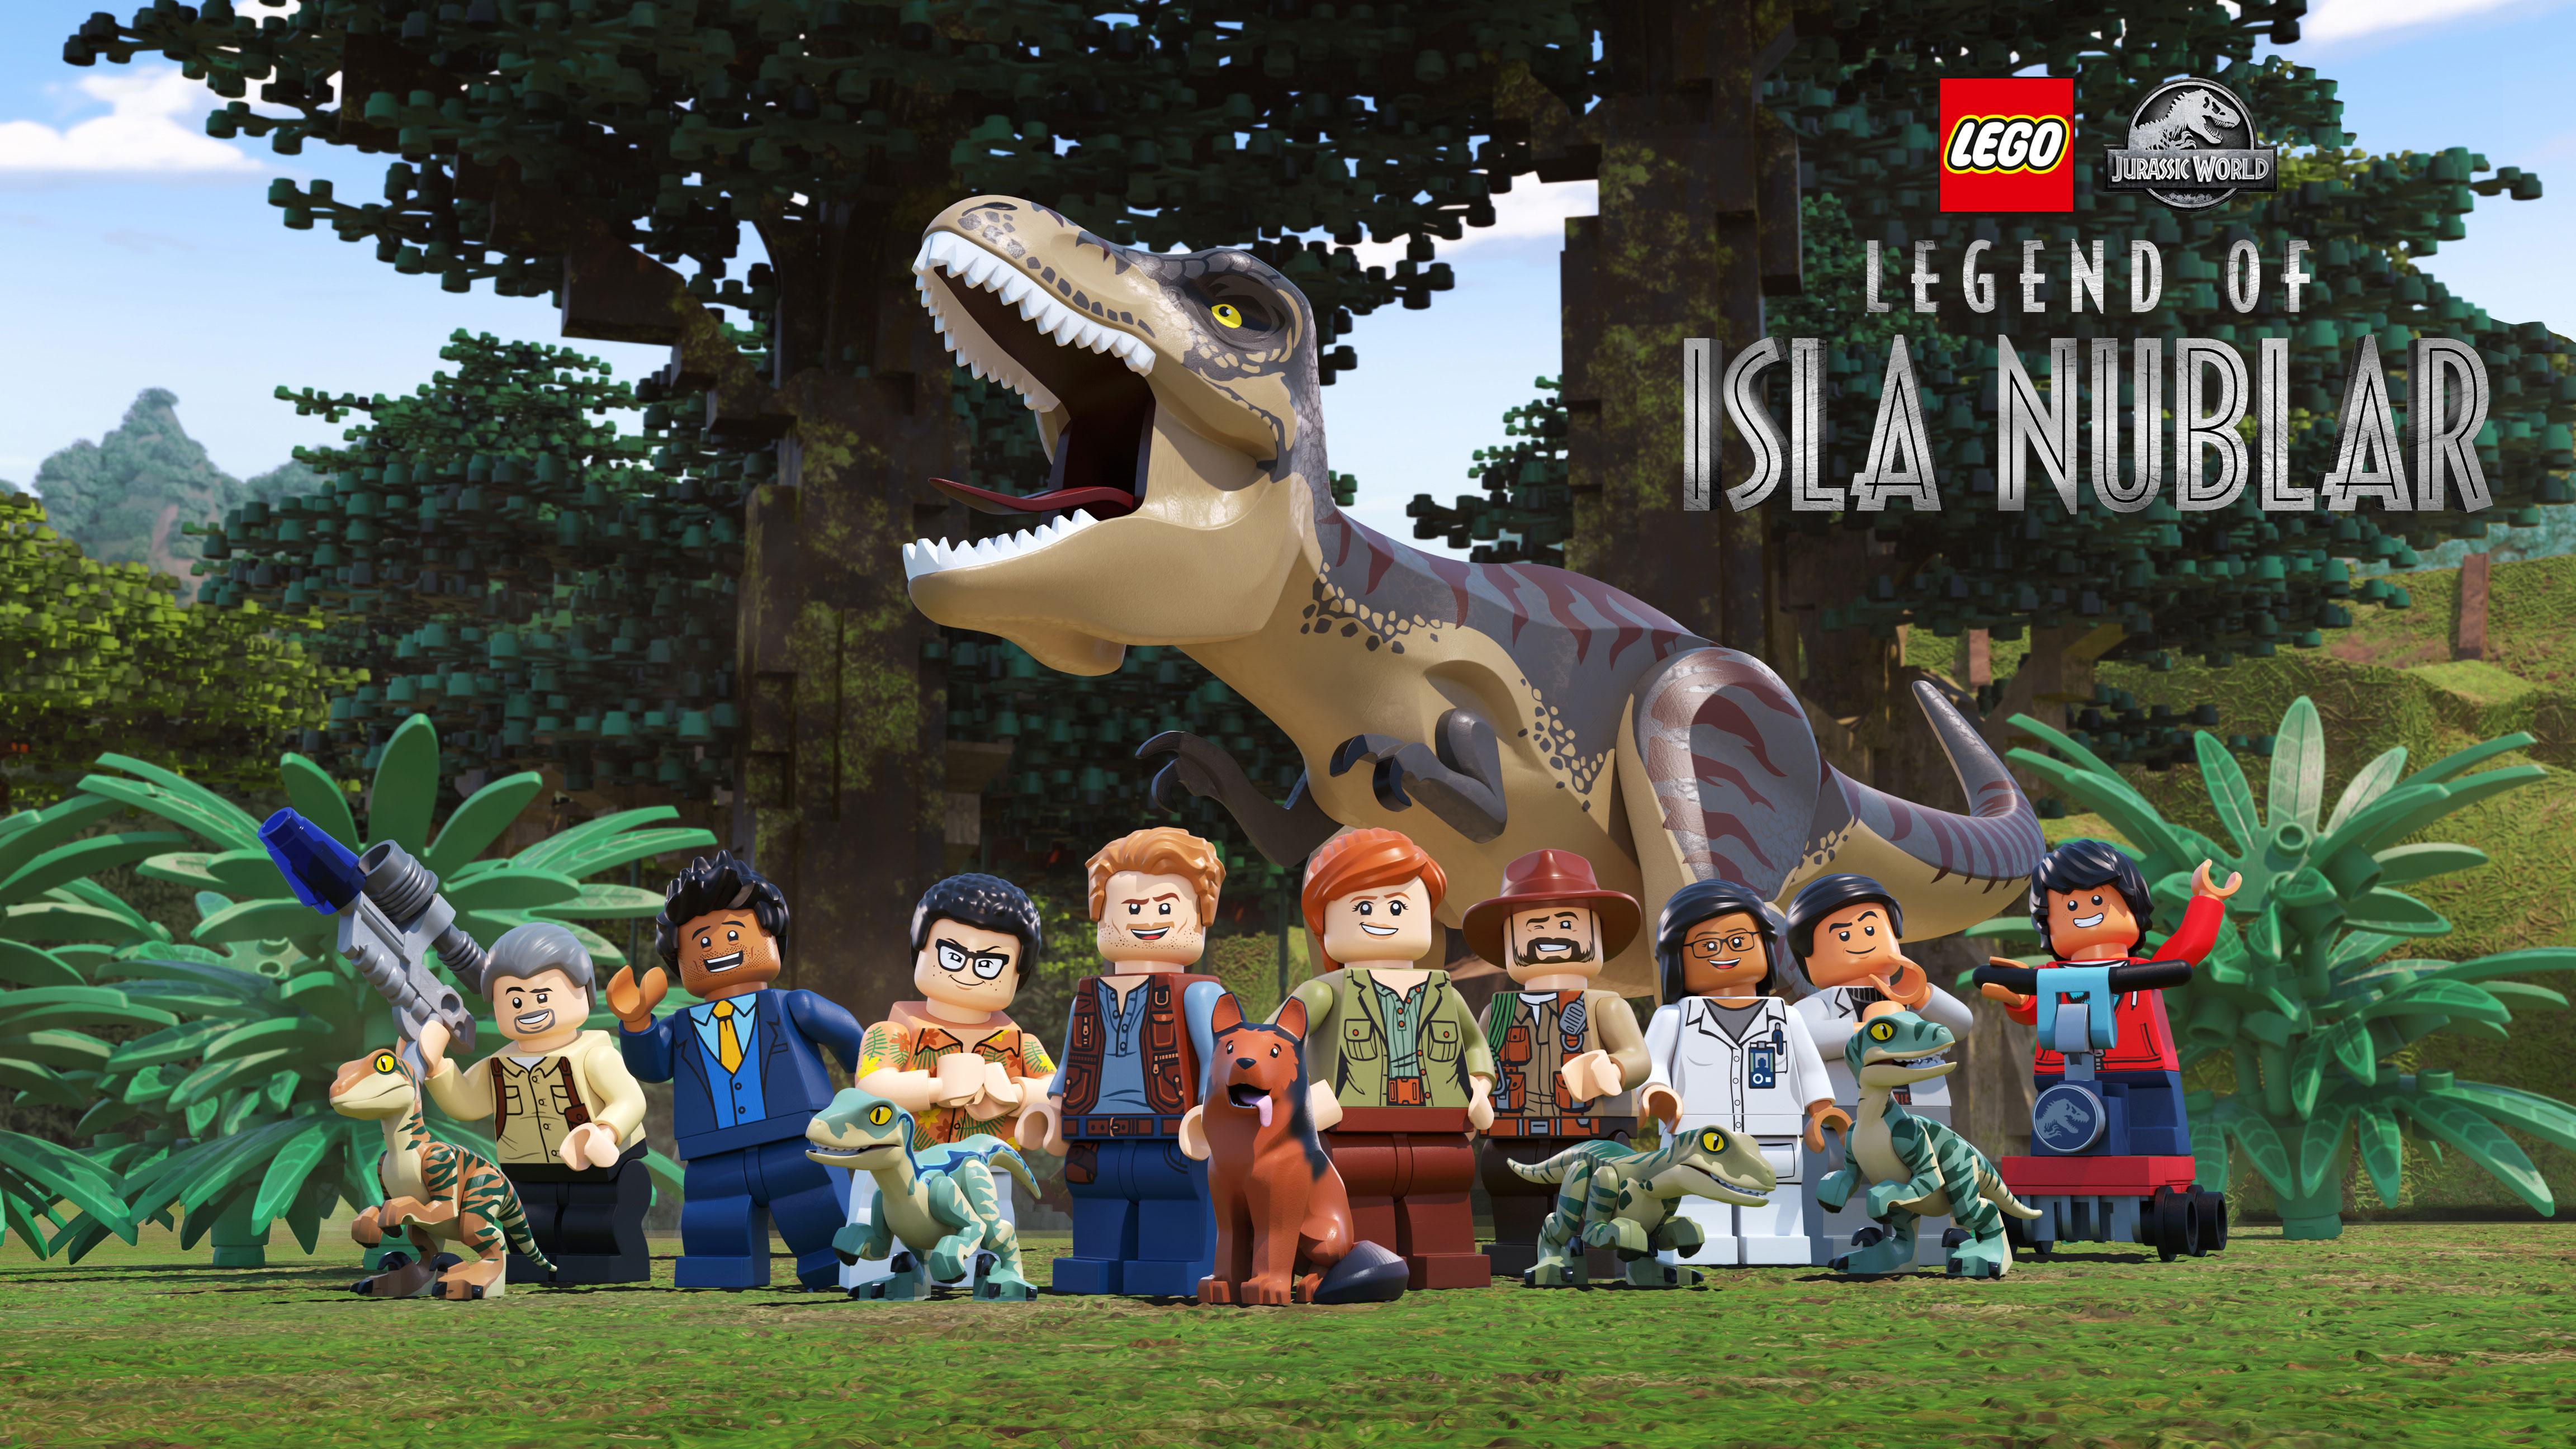 Lego Jurassic World: Legend of Isla Nublar